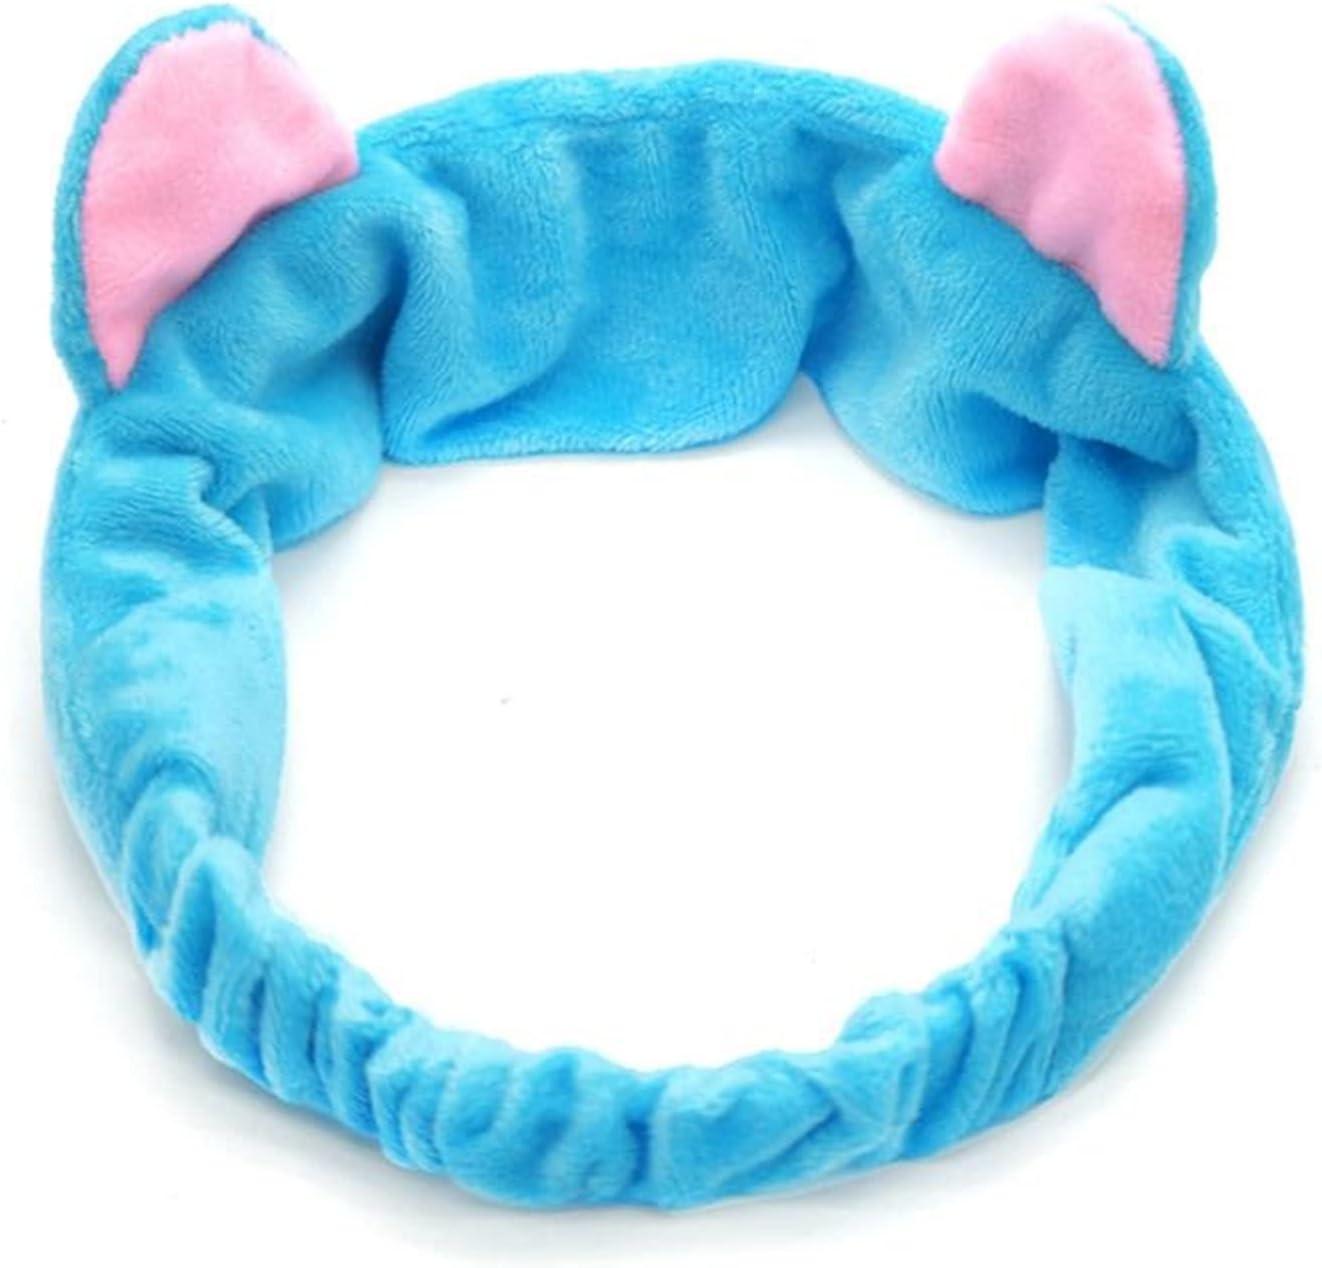 XIALIMY Hair Clips and Headbands Women's Face Wash Soft Coral Fleece Soft Headband Cute High Stretch Creative Animal Ear Makeup Portable Bath SPA Hair Accessory (Color : 04, Size : Free Size)